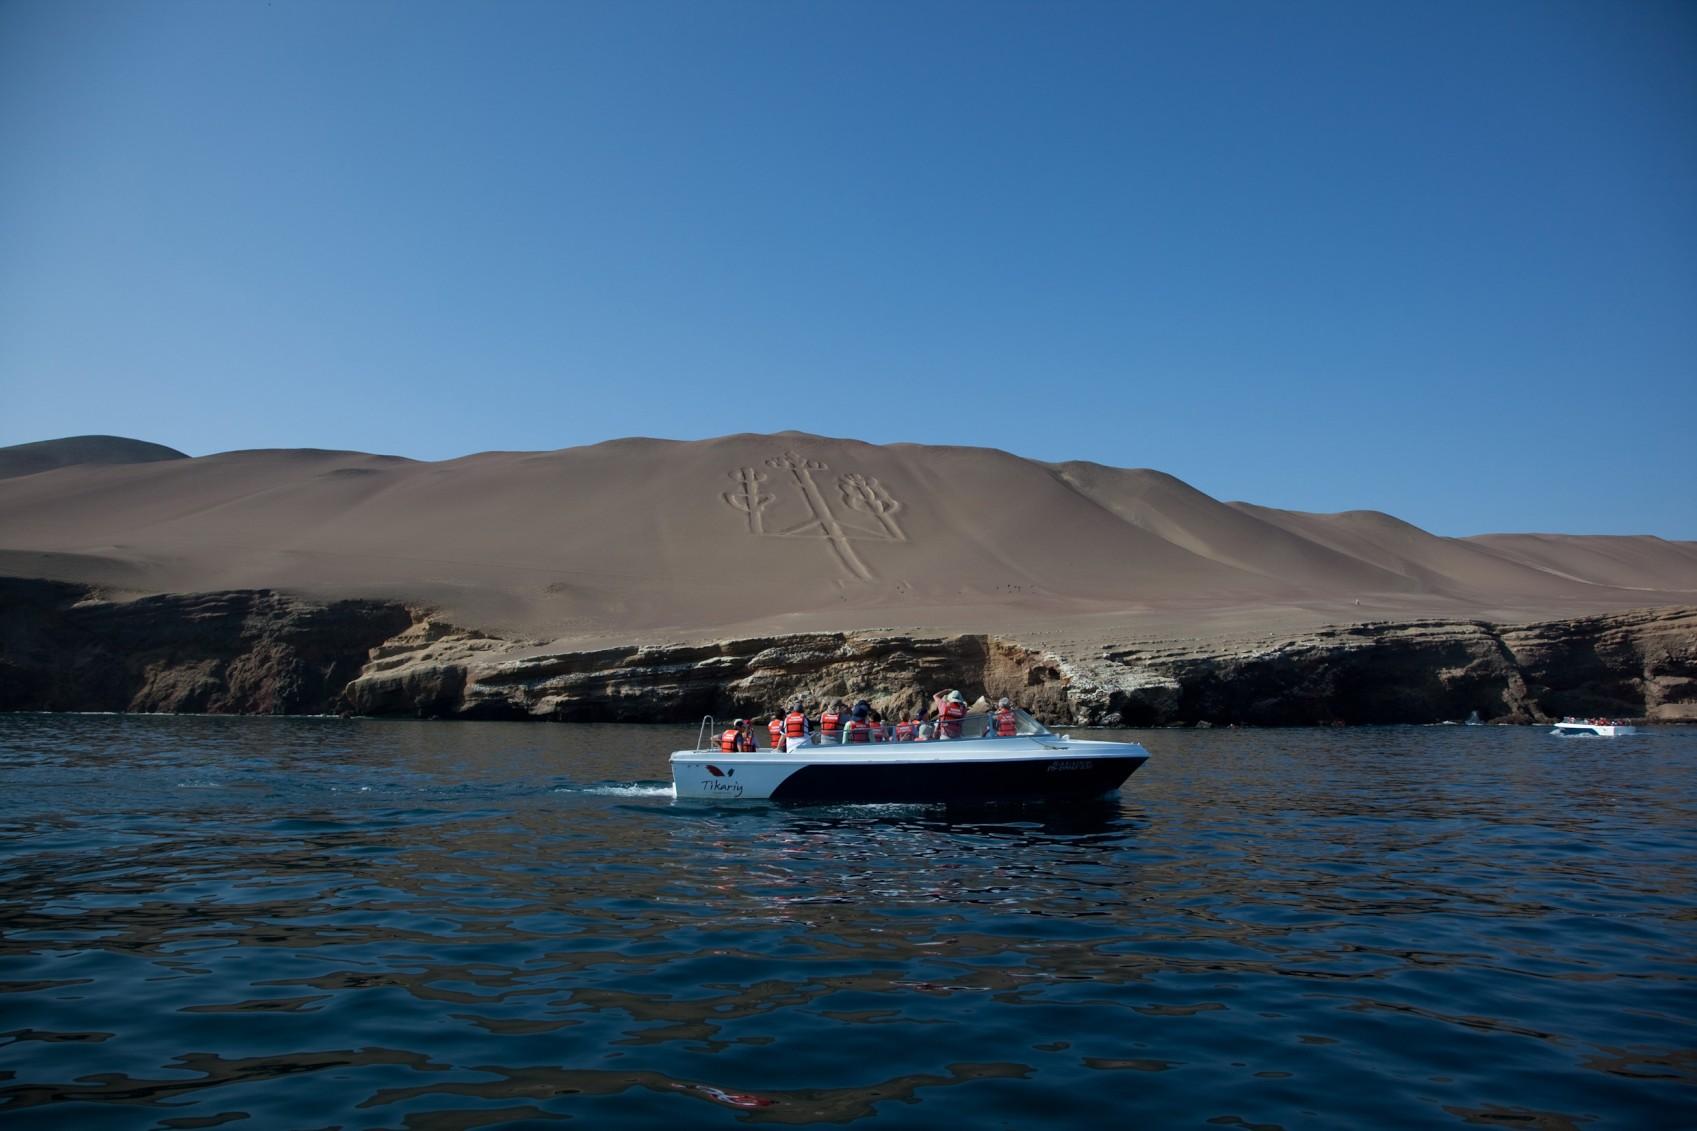 per47-boat-trip-to-ballestas-paracas-free-vti